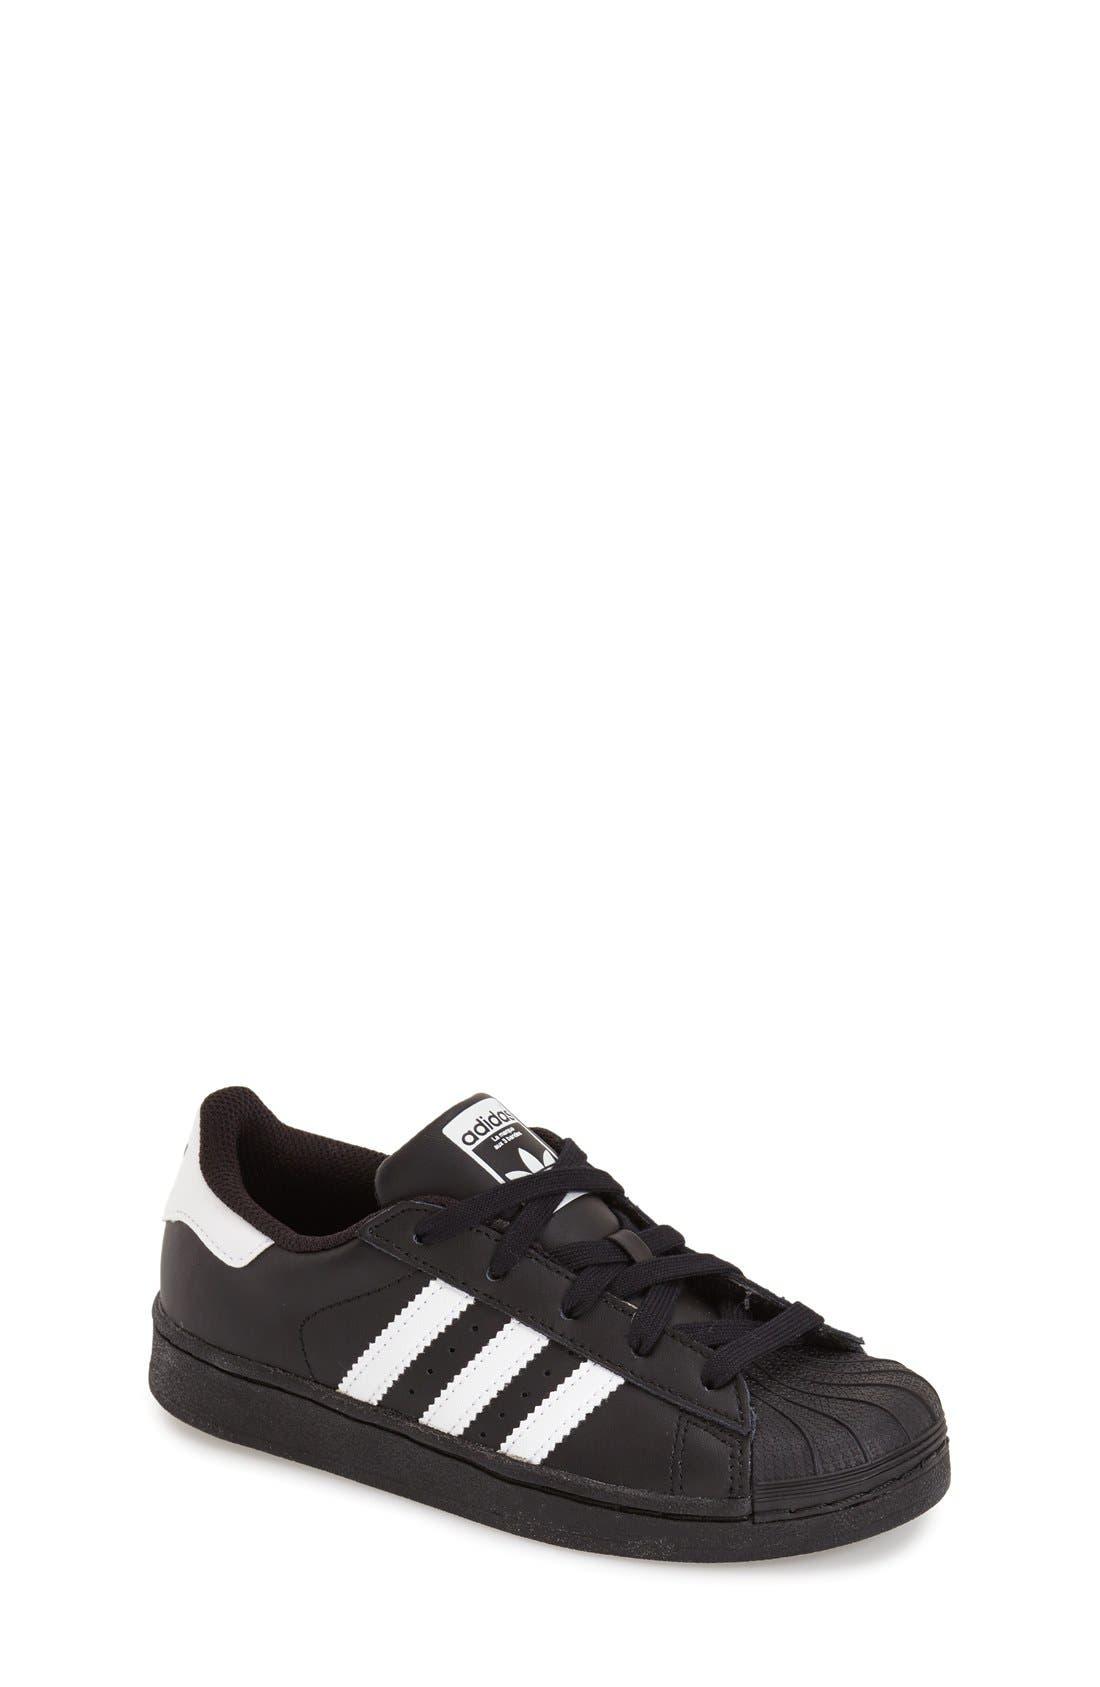 Alternate Image 1 Selected - adidas 'Superstar' Sneaker (Baby, Walker, Toddler, Little Kid & Big Kid)